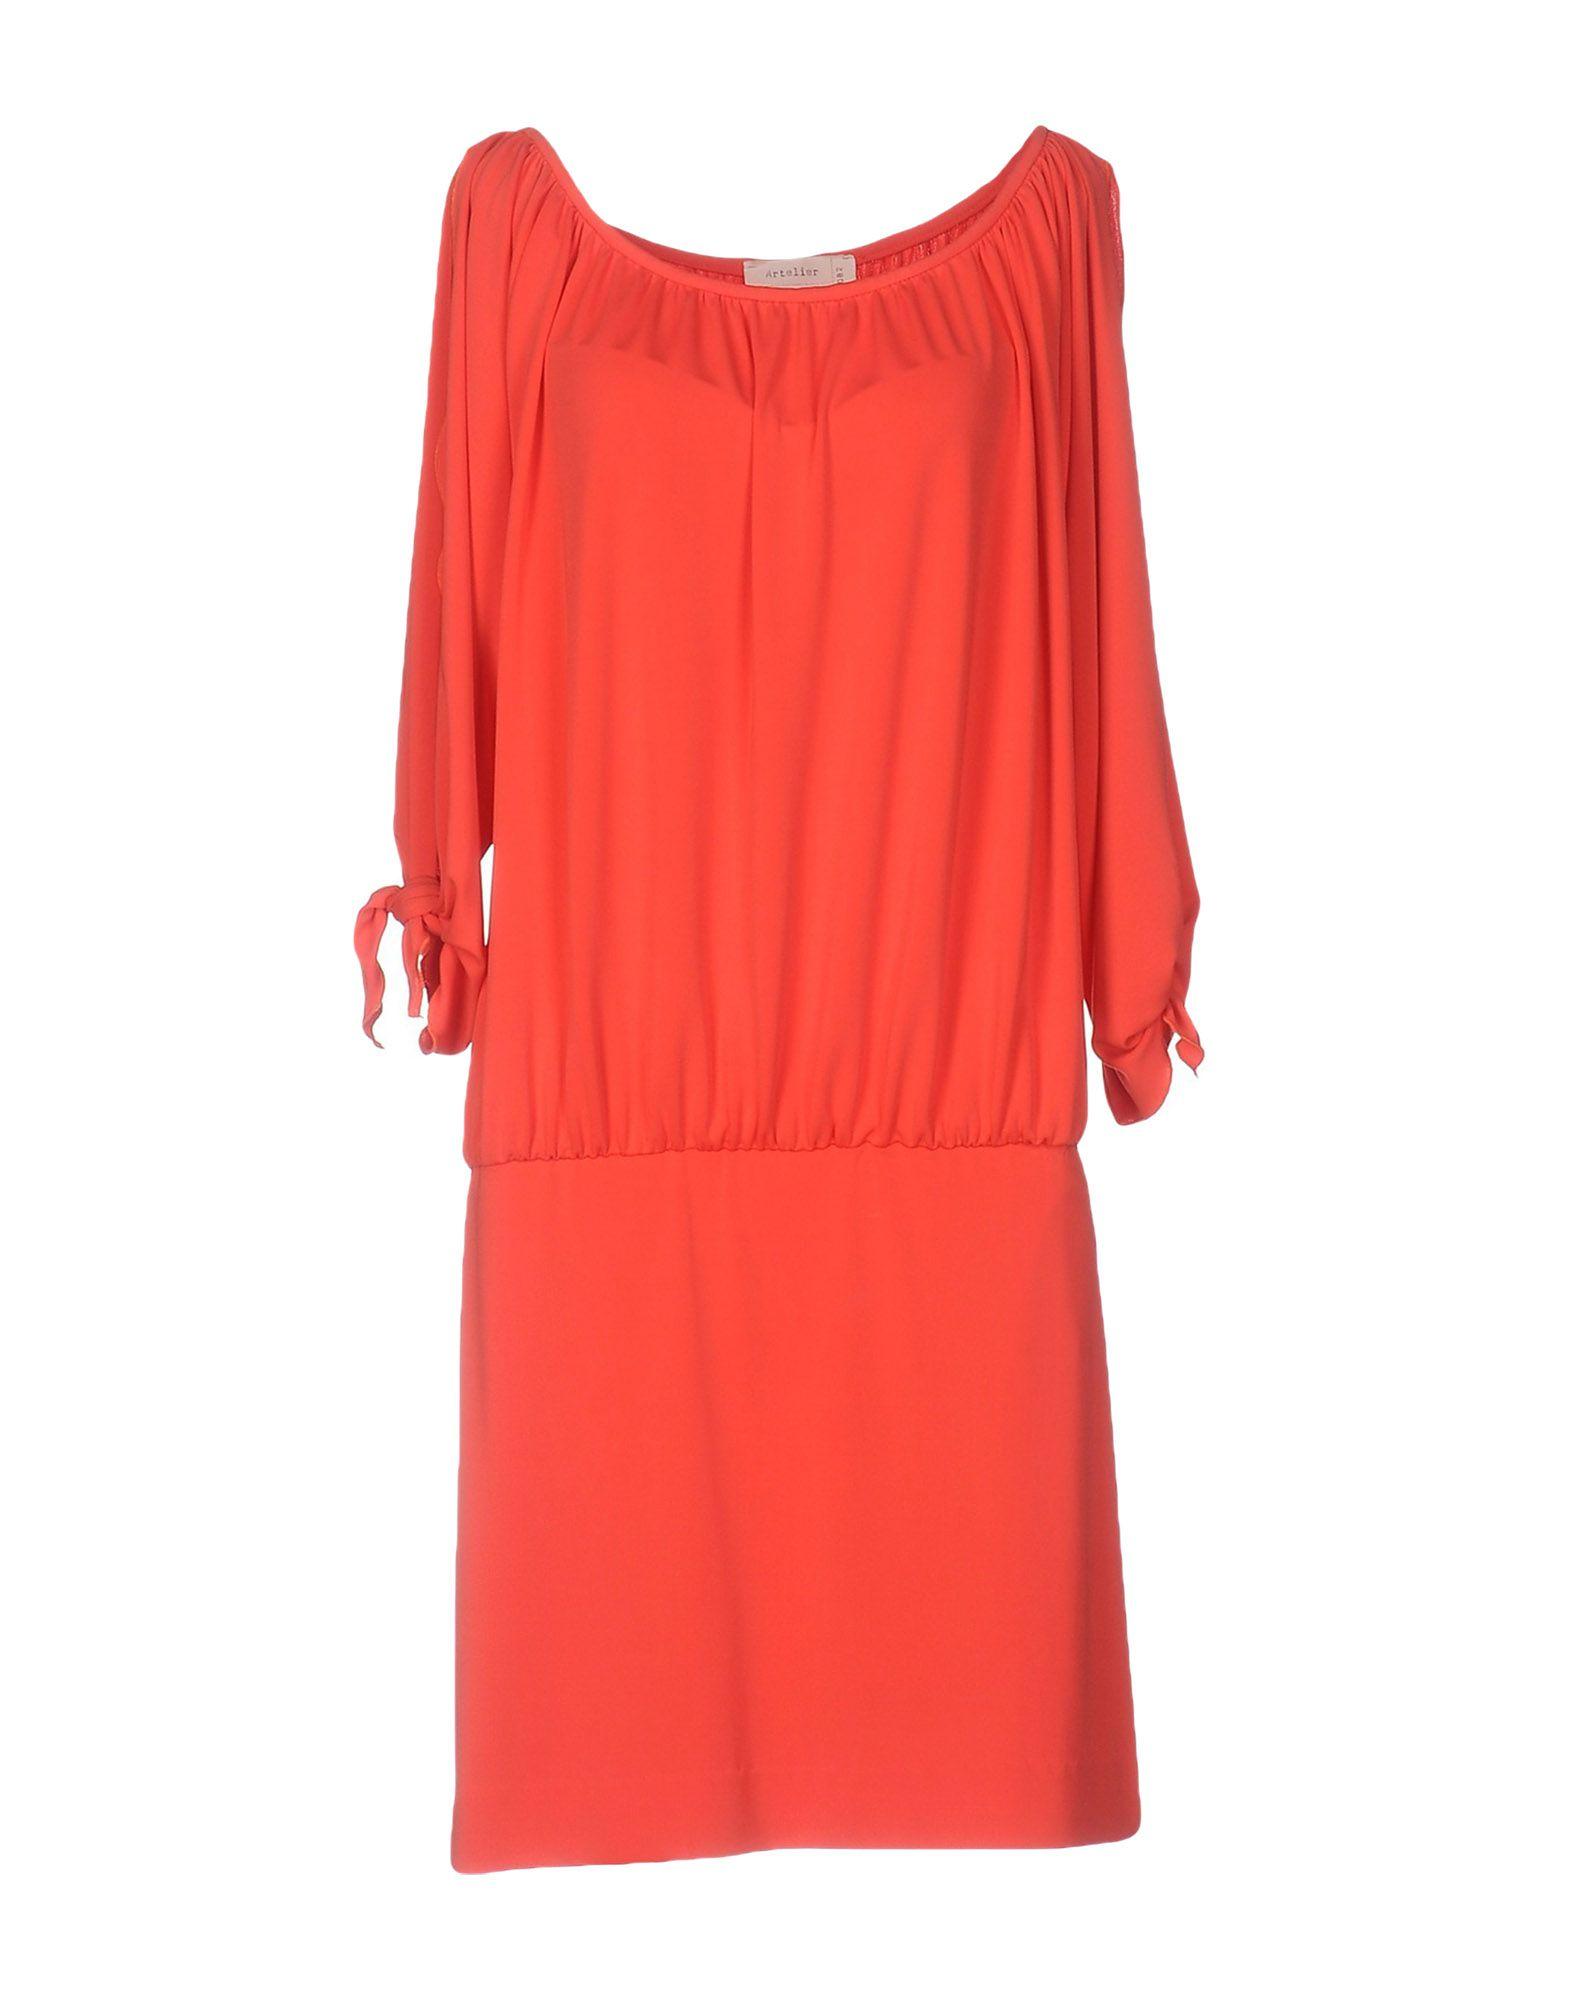 NICOLE MILLER ARTELIER Короткое платье платья nicole collection платье